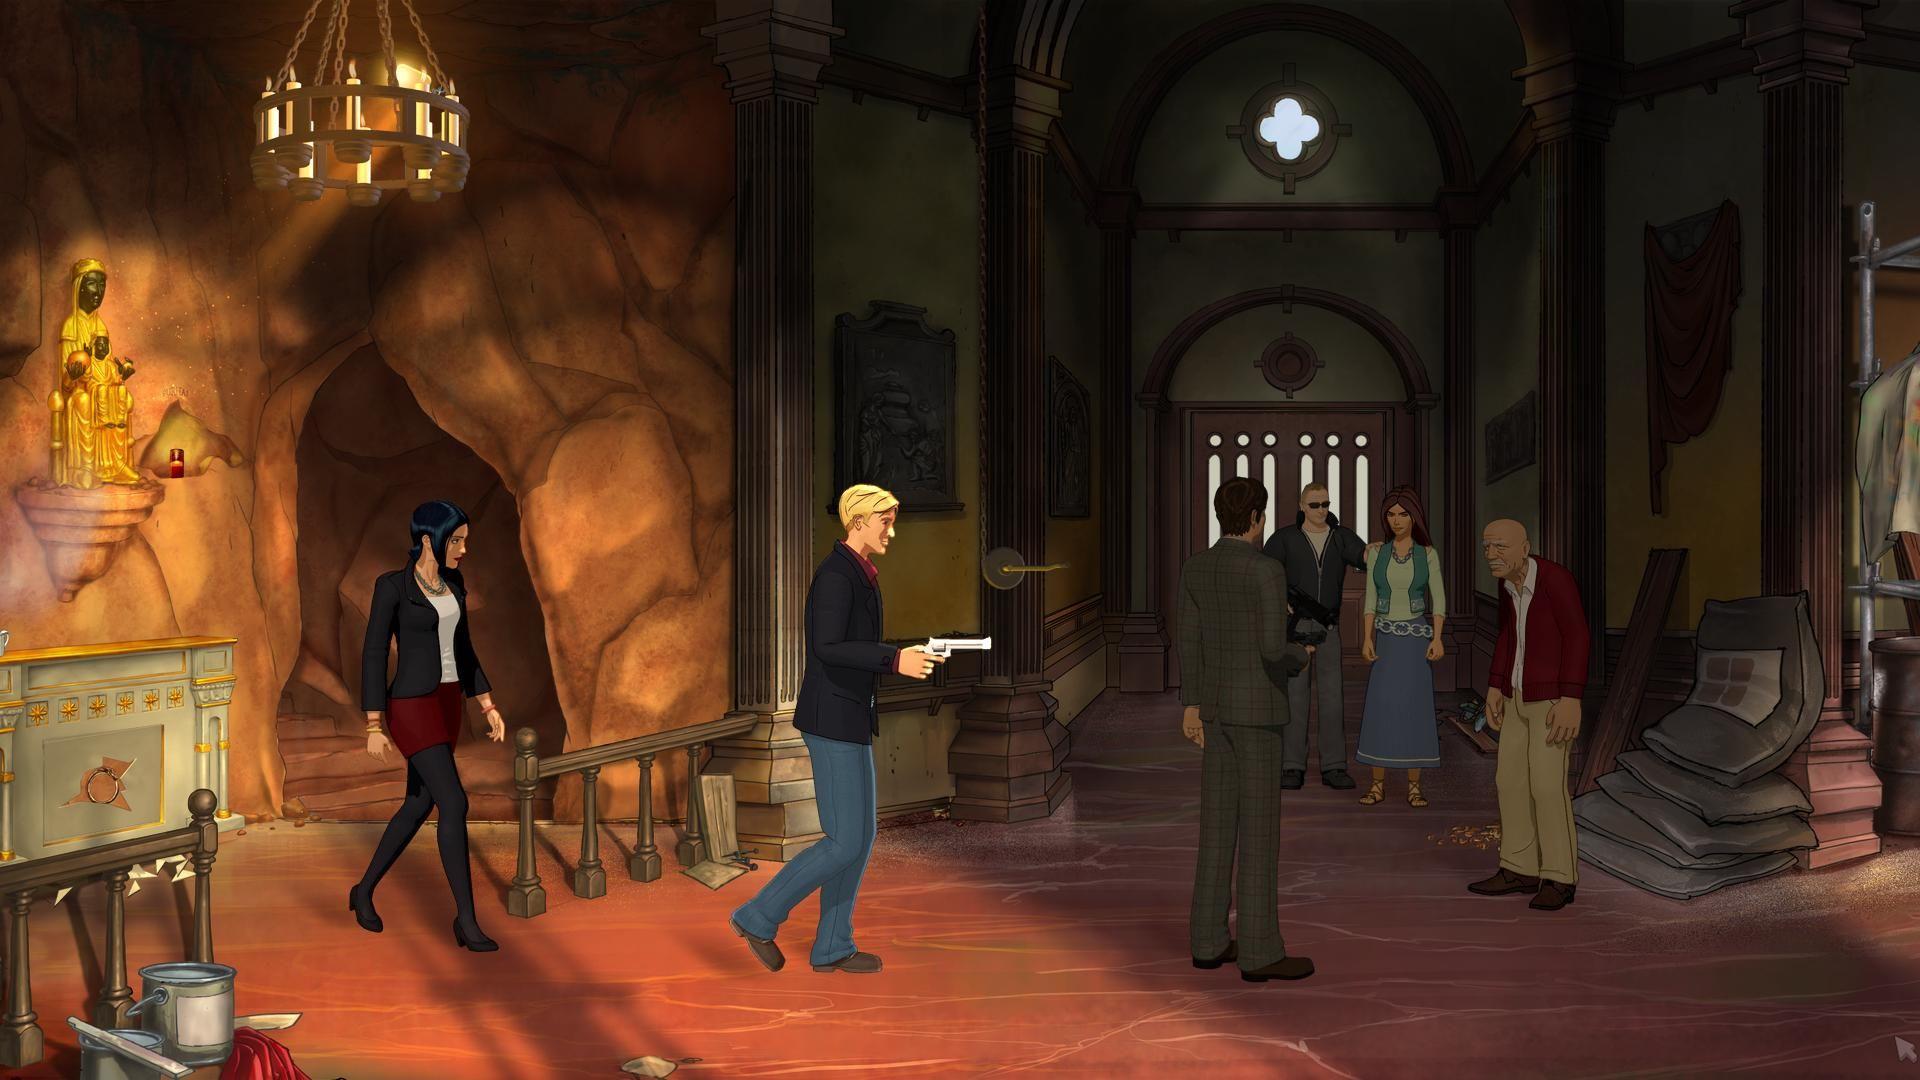 Broken Sword 5: The Serpent's Curse Backgrounds on Wallpapers Vista